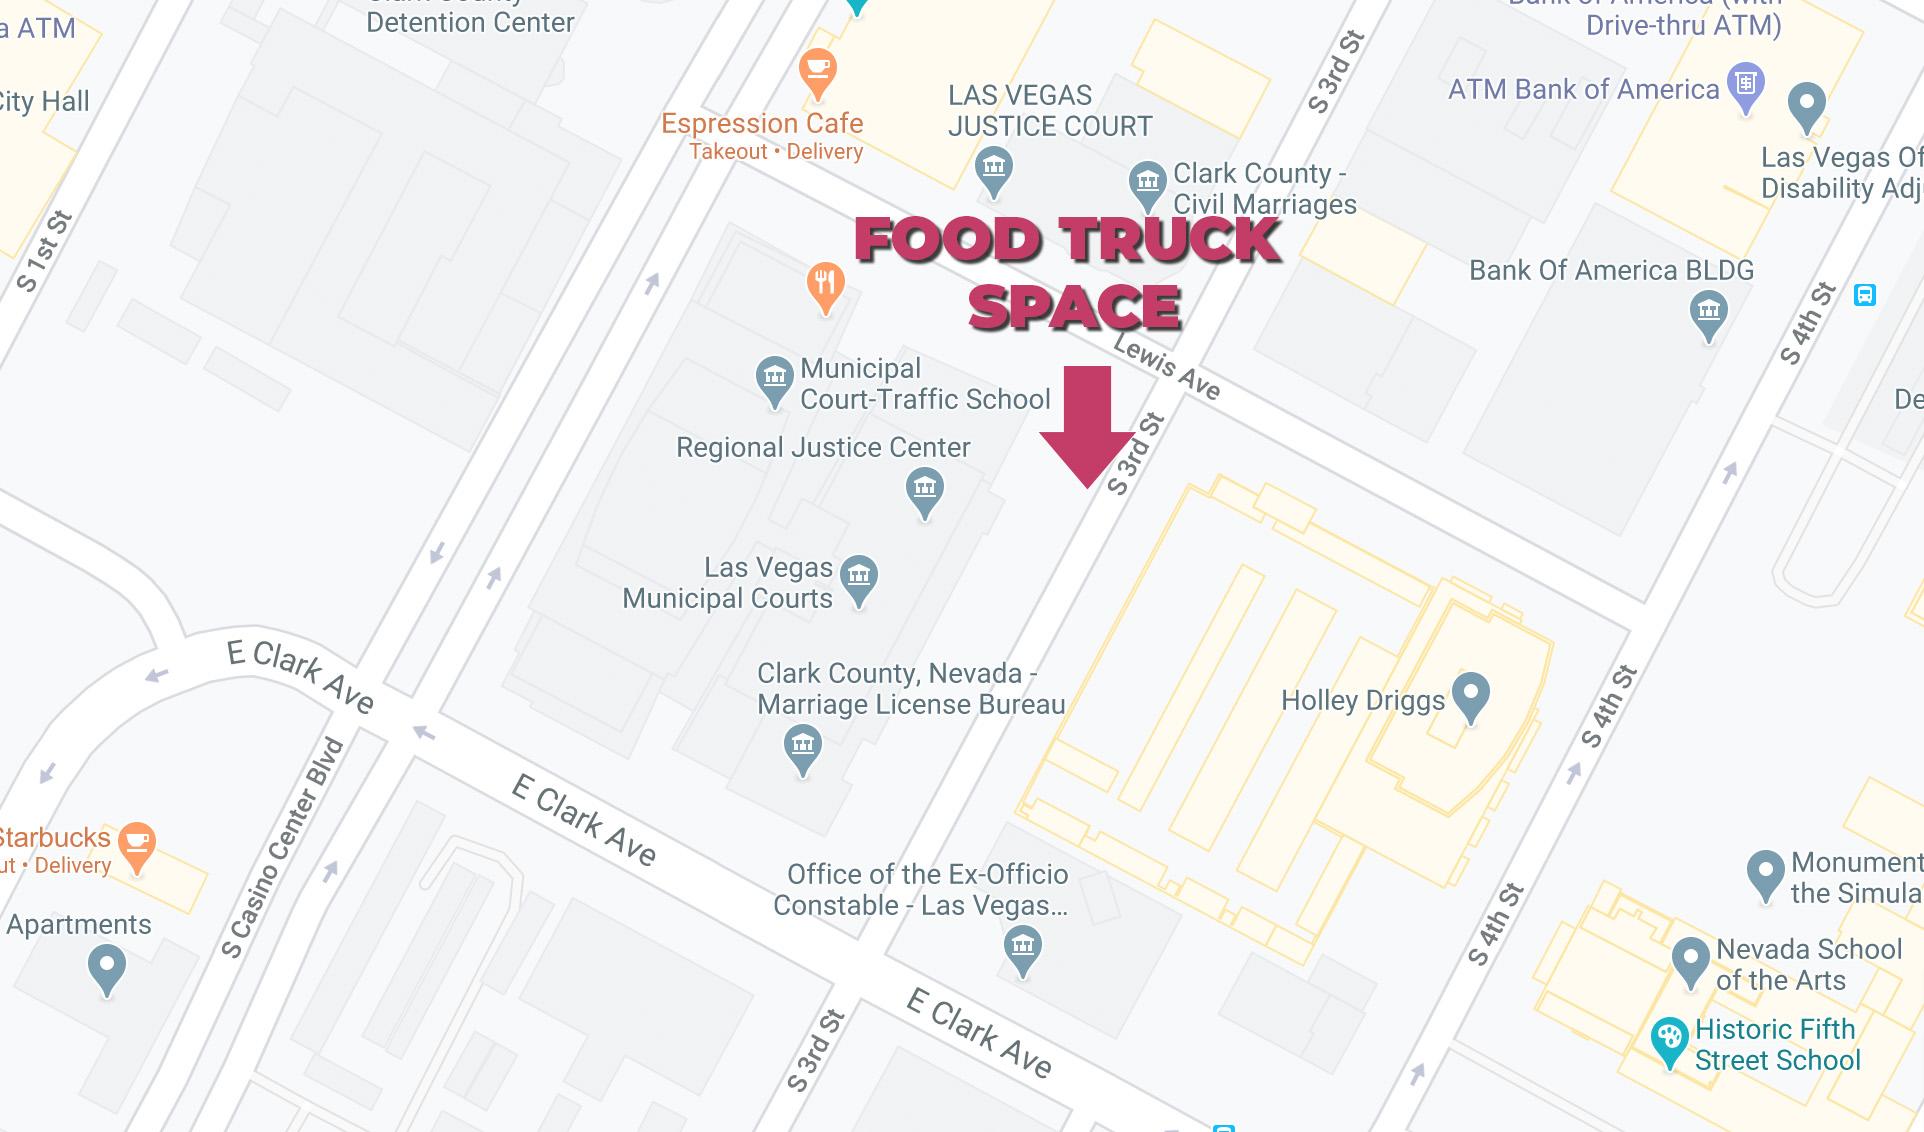 FoodTruckSpace